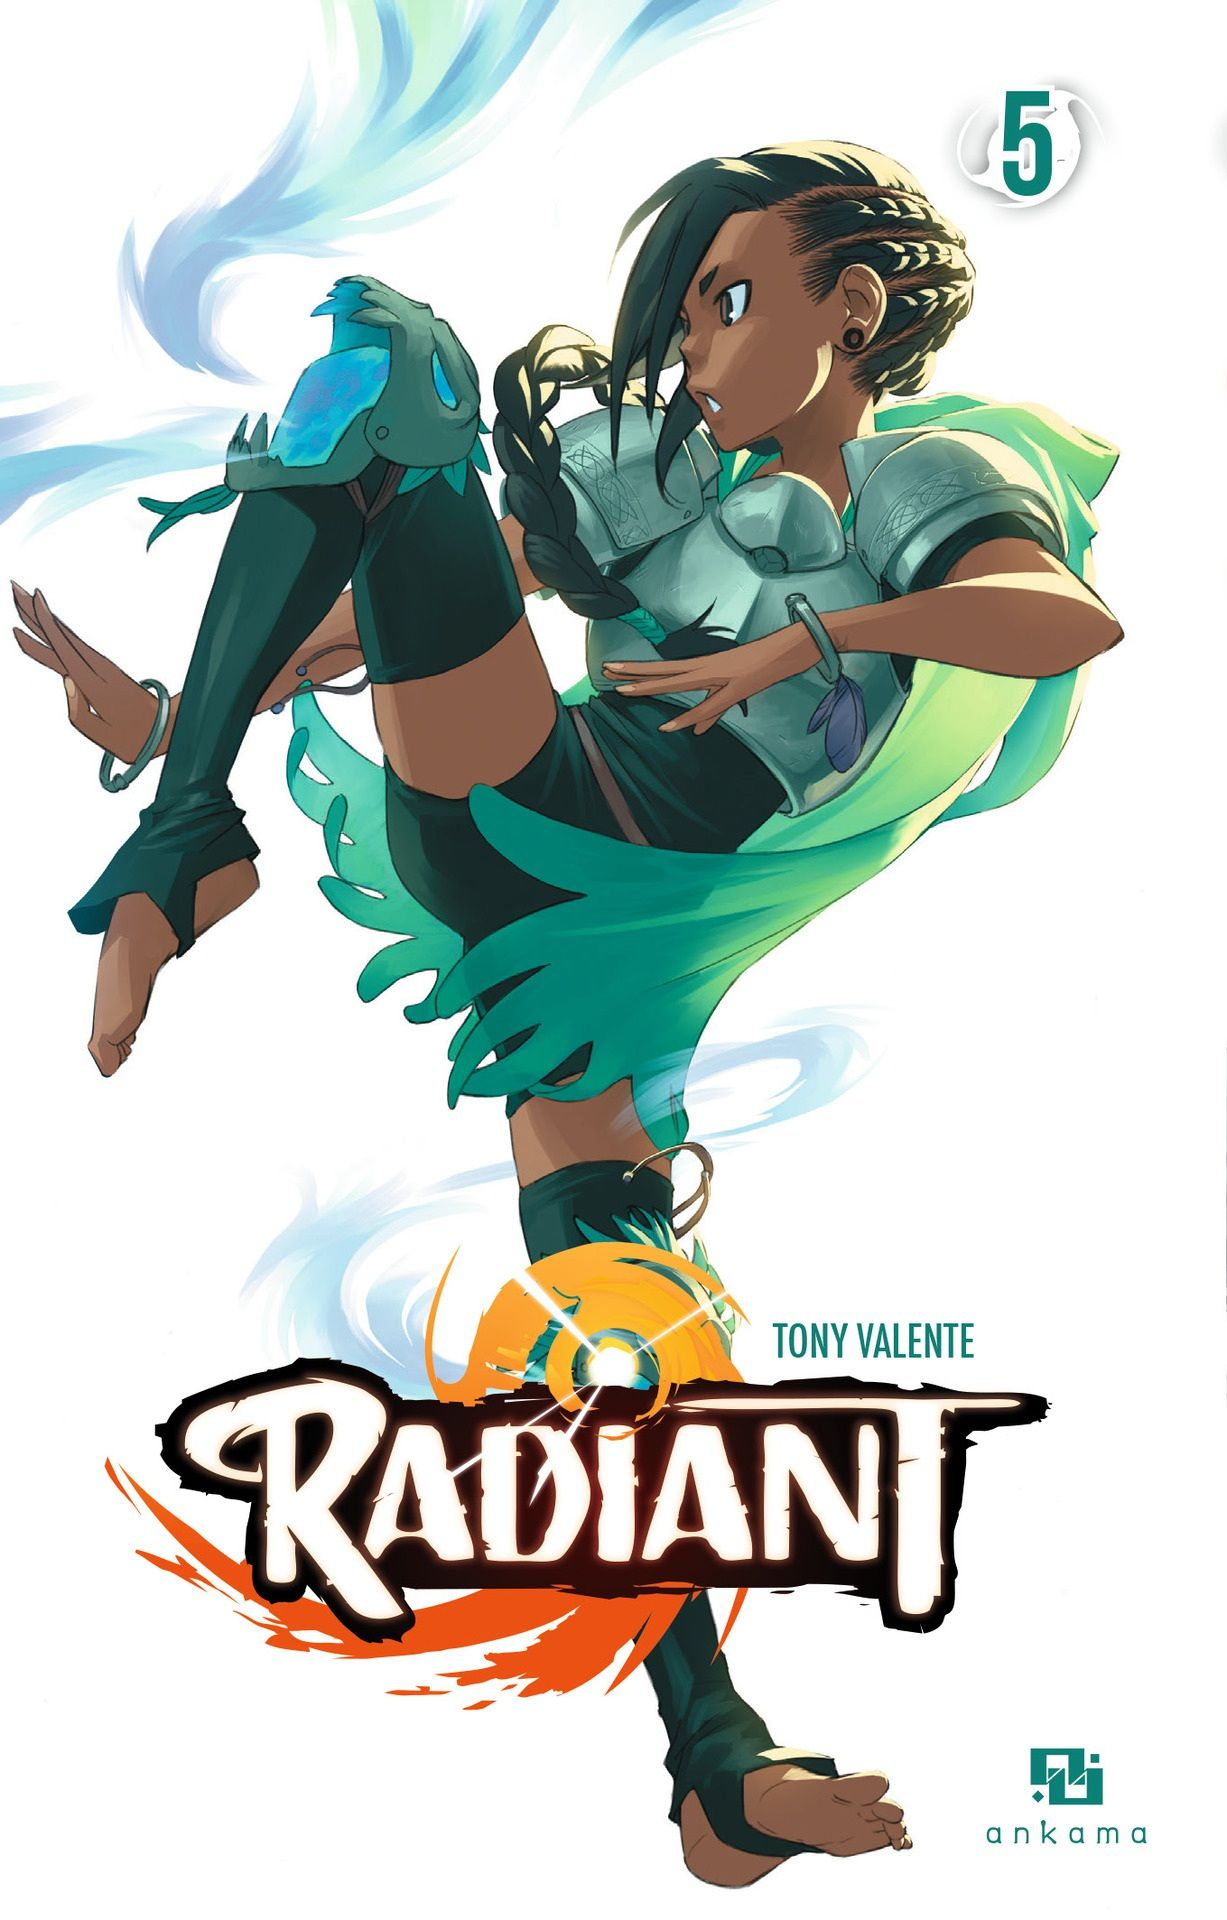 Scan Radiant Tome 5 VF page 1 Dessin batman, Ankama